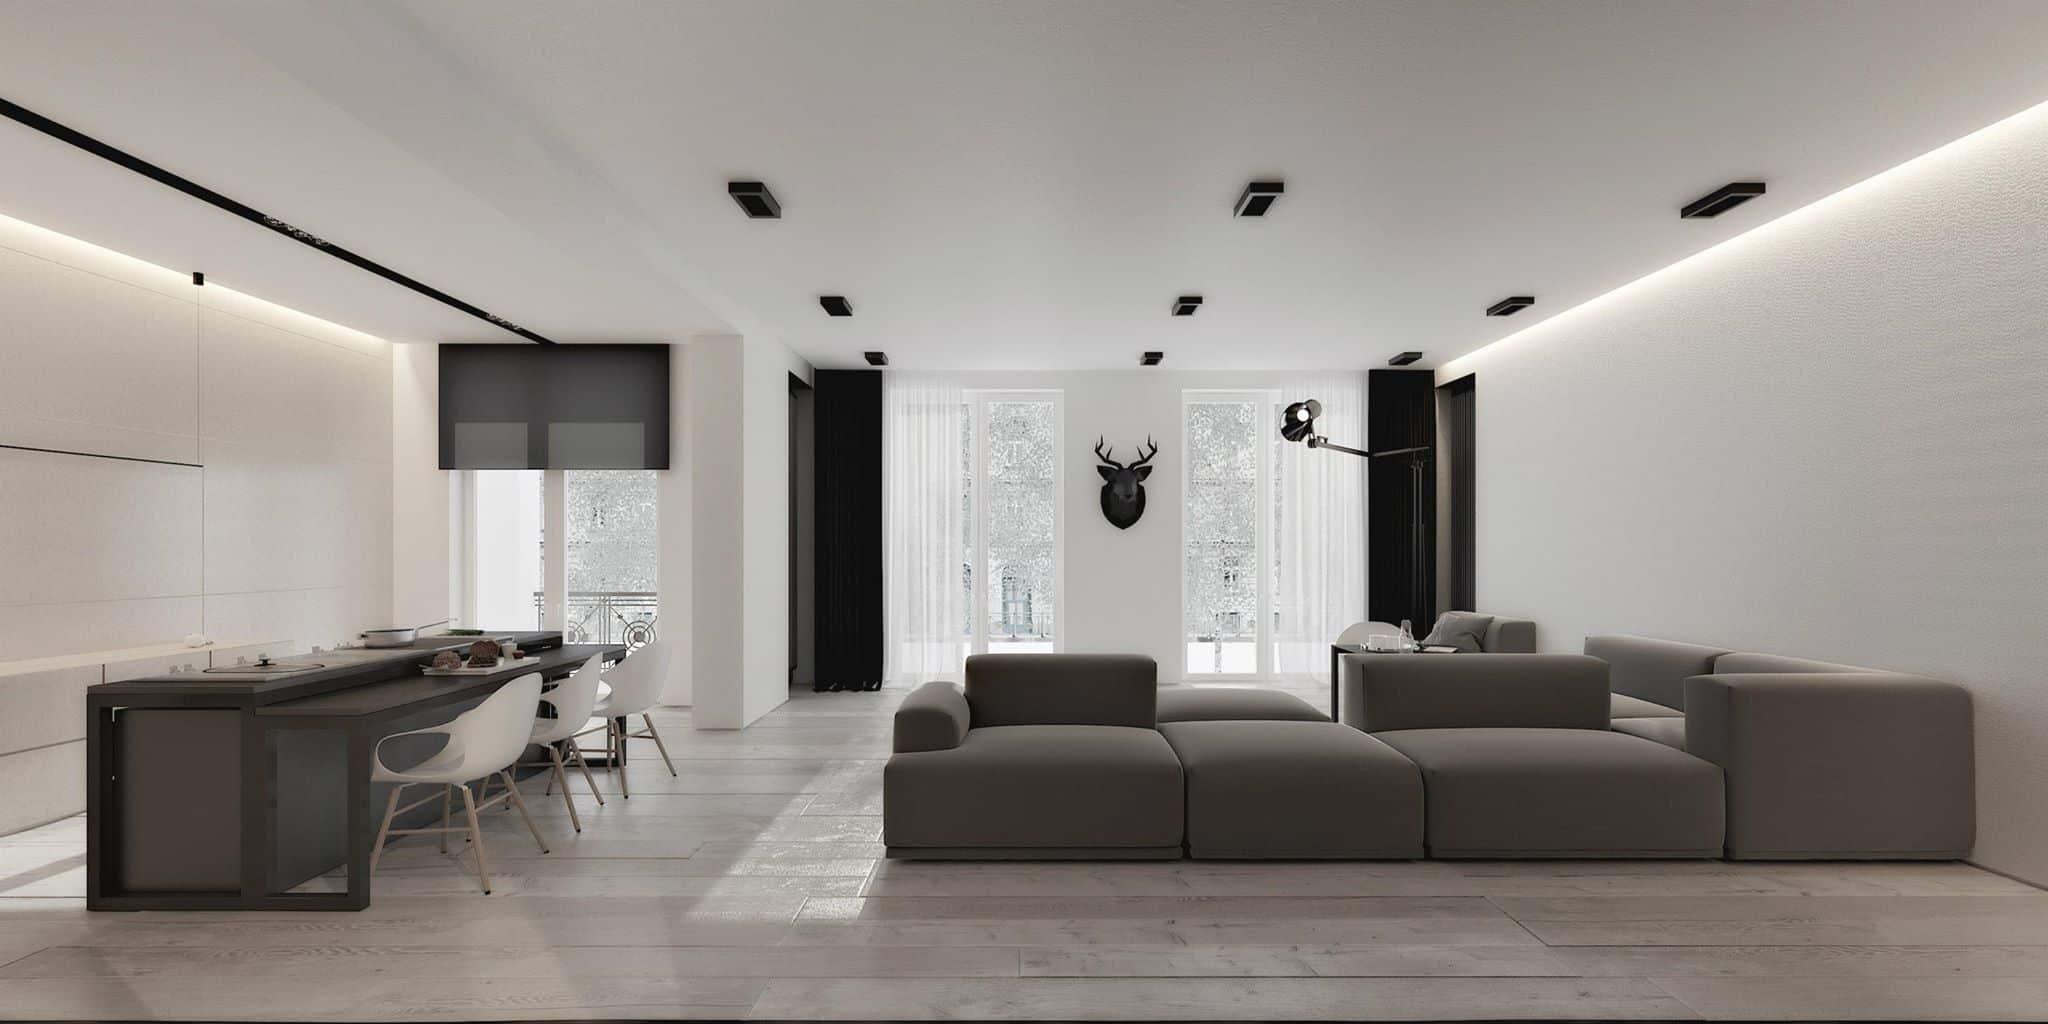 AB1 House by Igor Sirotov Architect